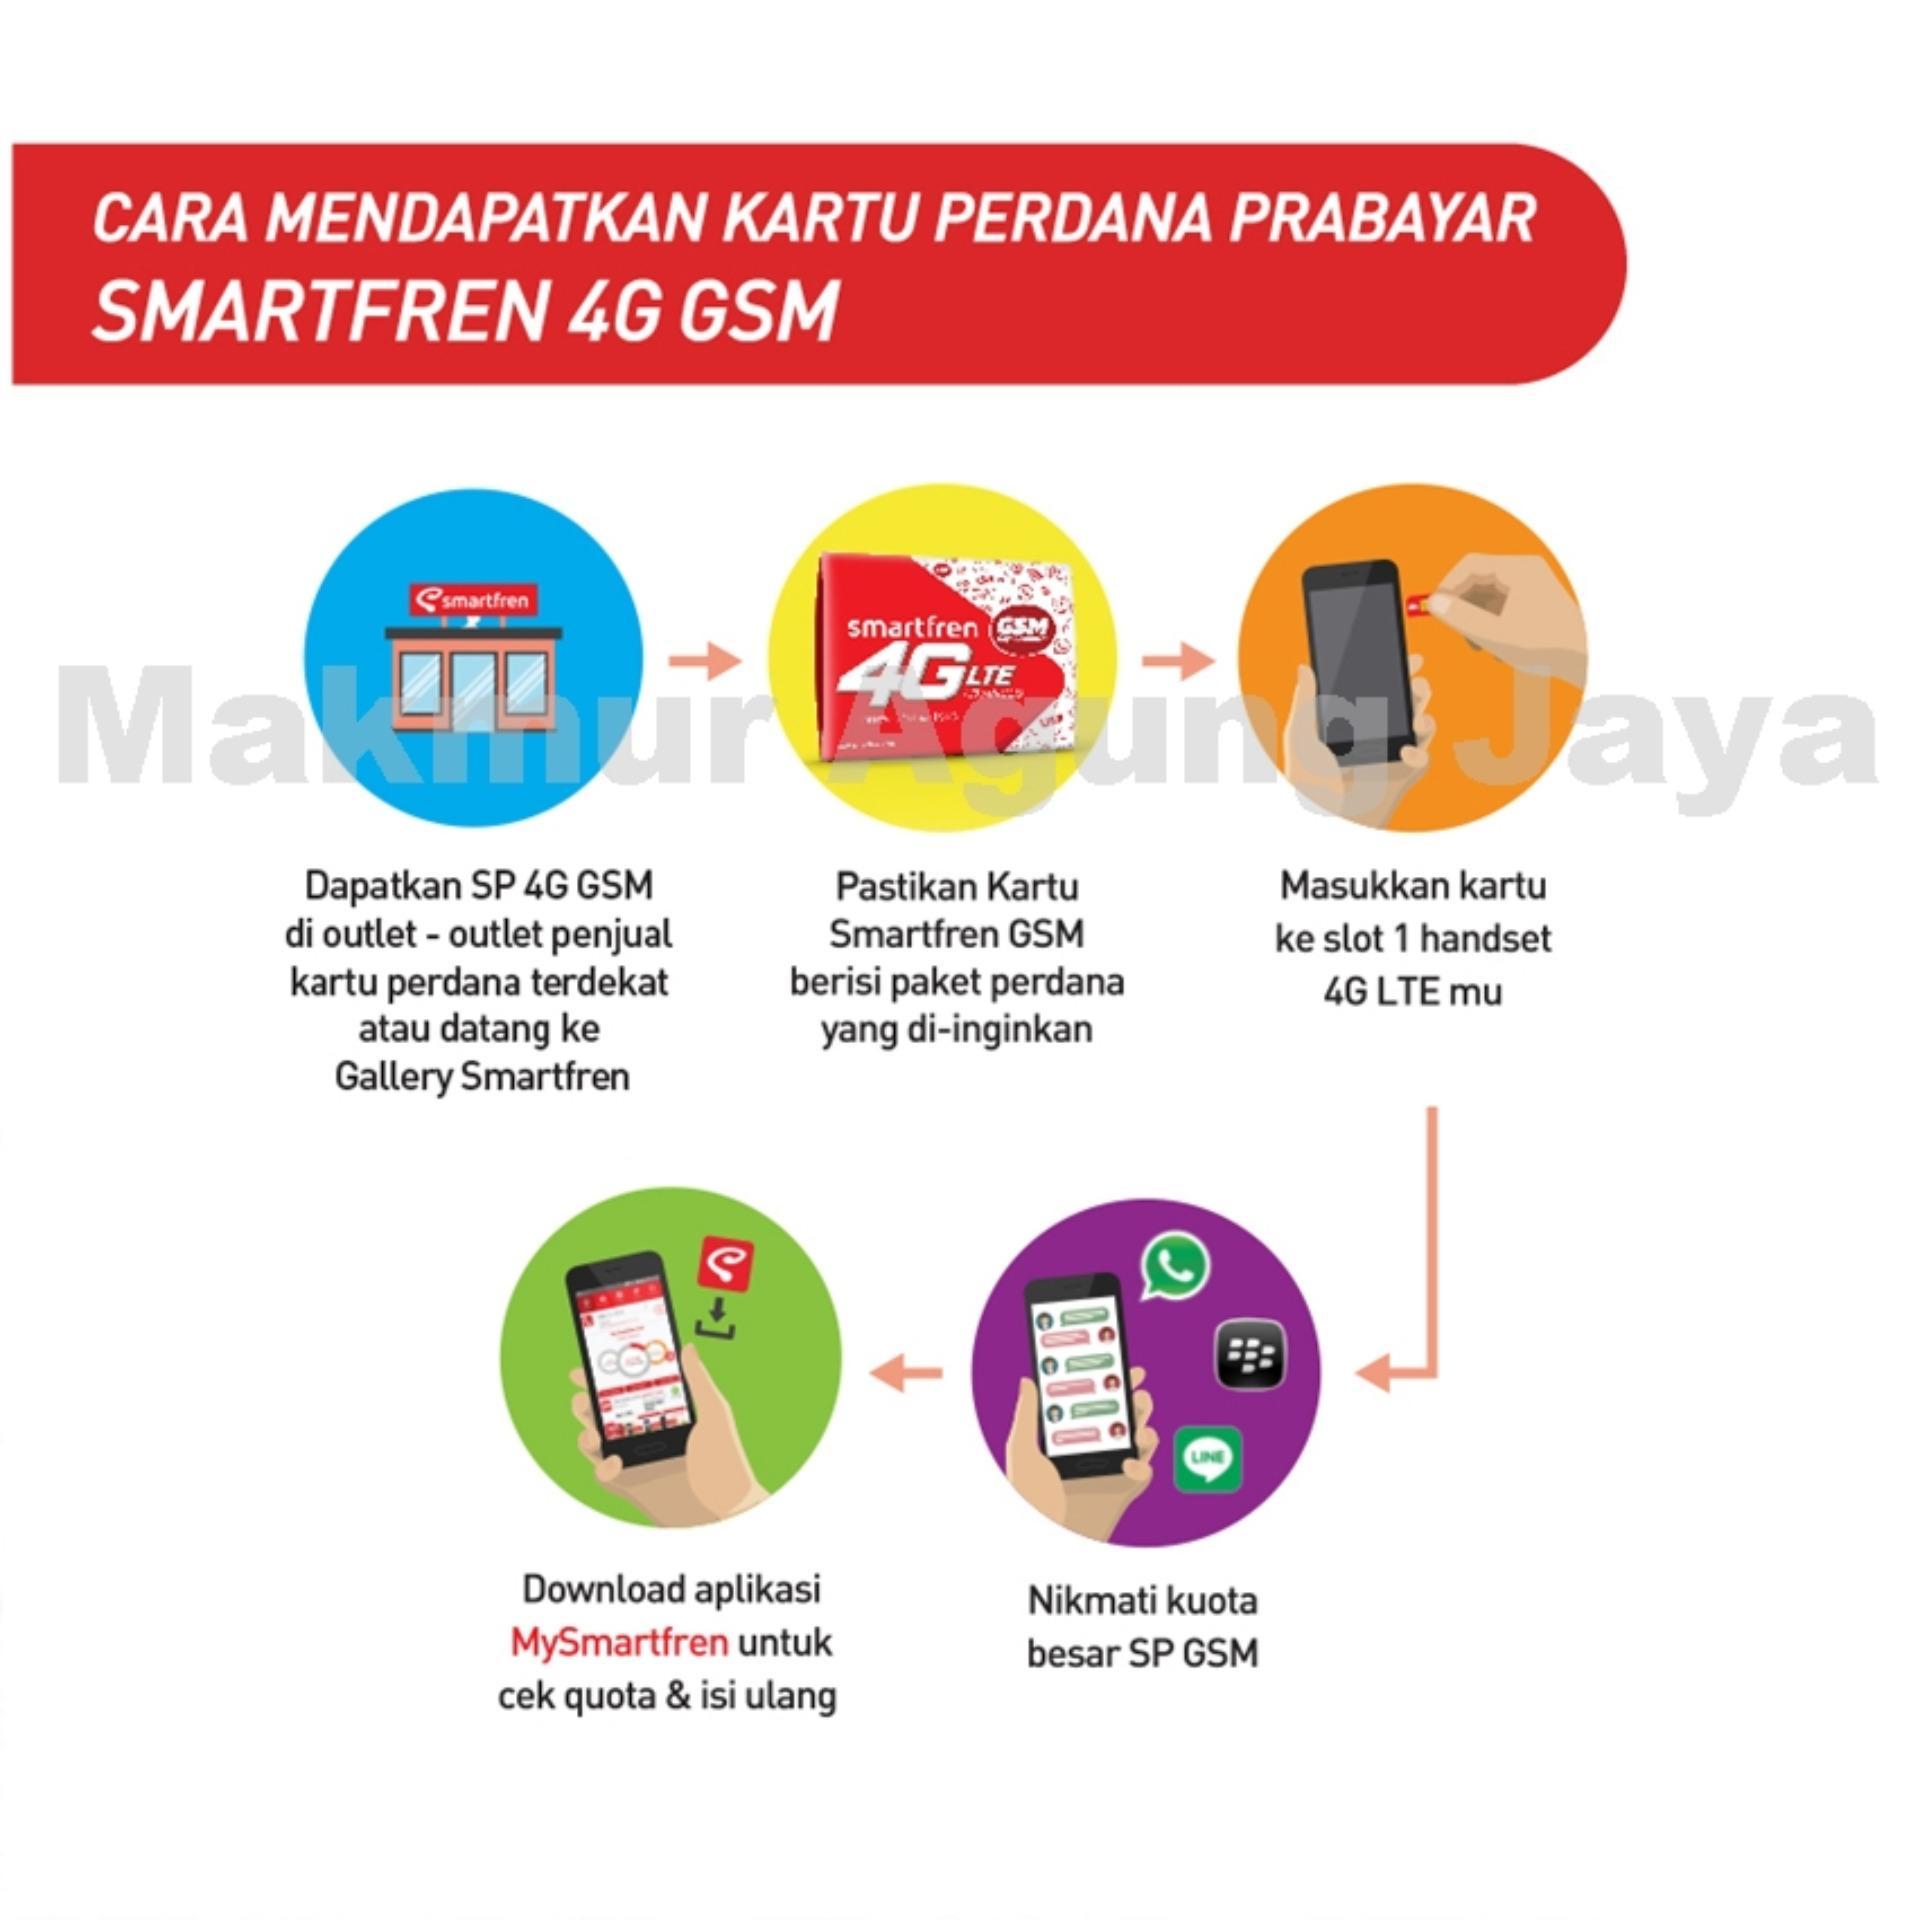 Harga Termurah Smartfren Kartu Perdana Gsm 4g Kuota 13 Gb Eshop Checker Sp Free 37gb